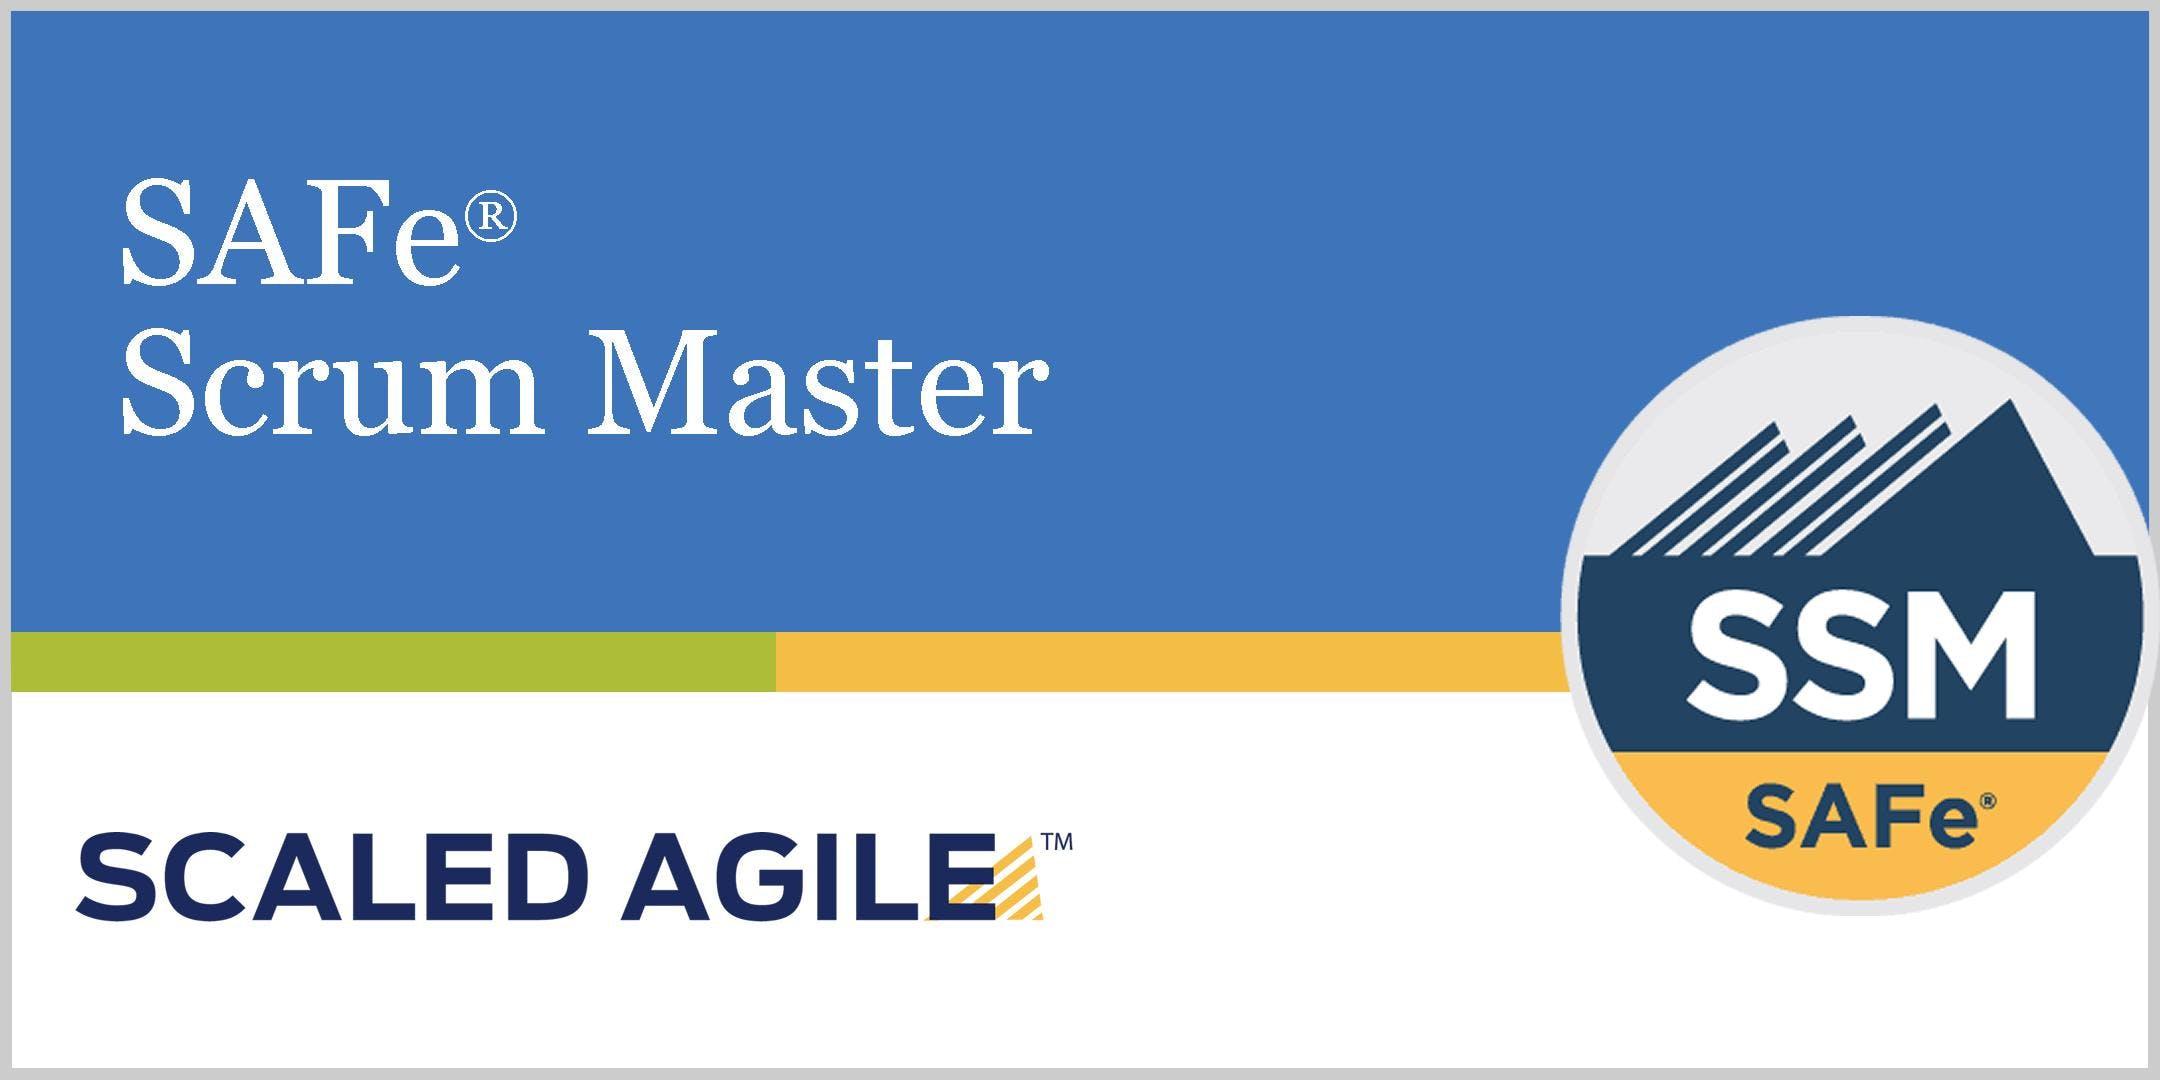 Scrum Master Training Ssm 45 Agile Certification At Hyatt Place